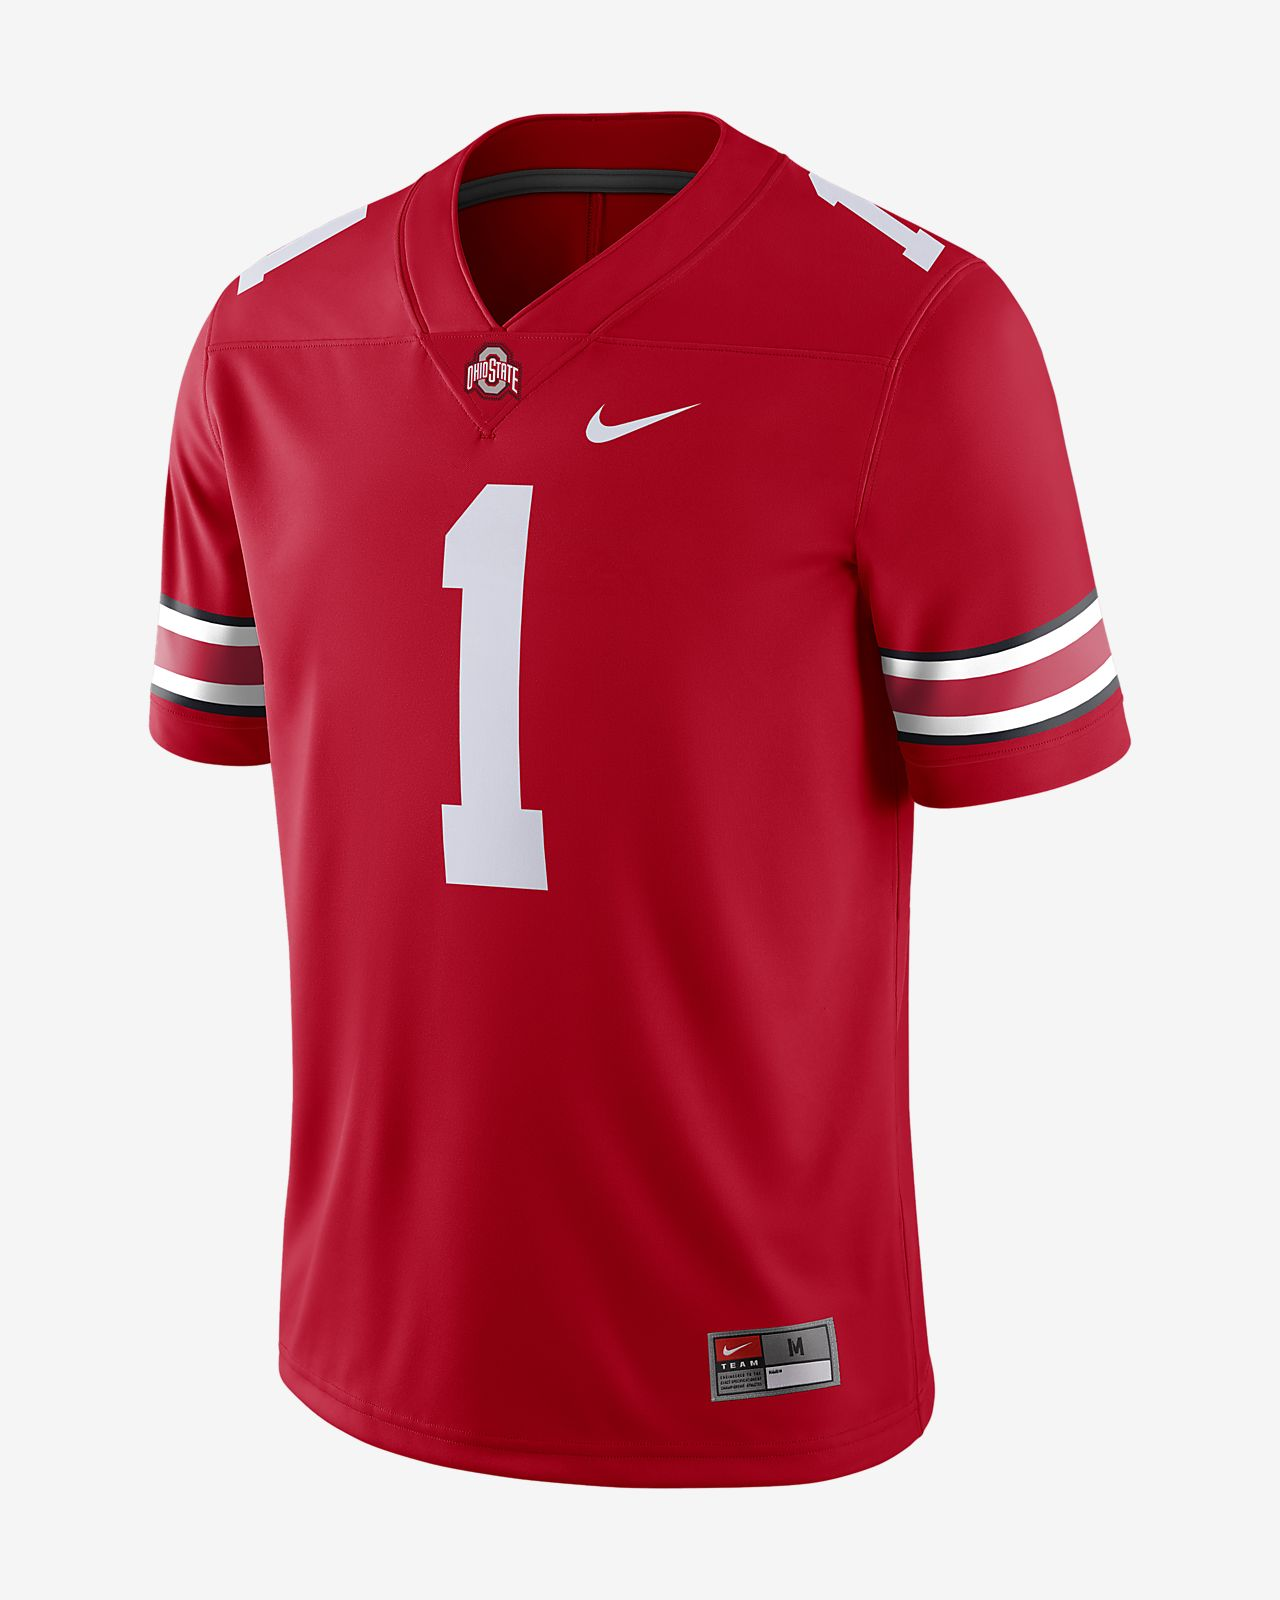 Nike College Dri-FIT Game (Ohio State) Men's Football Jersey